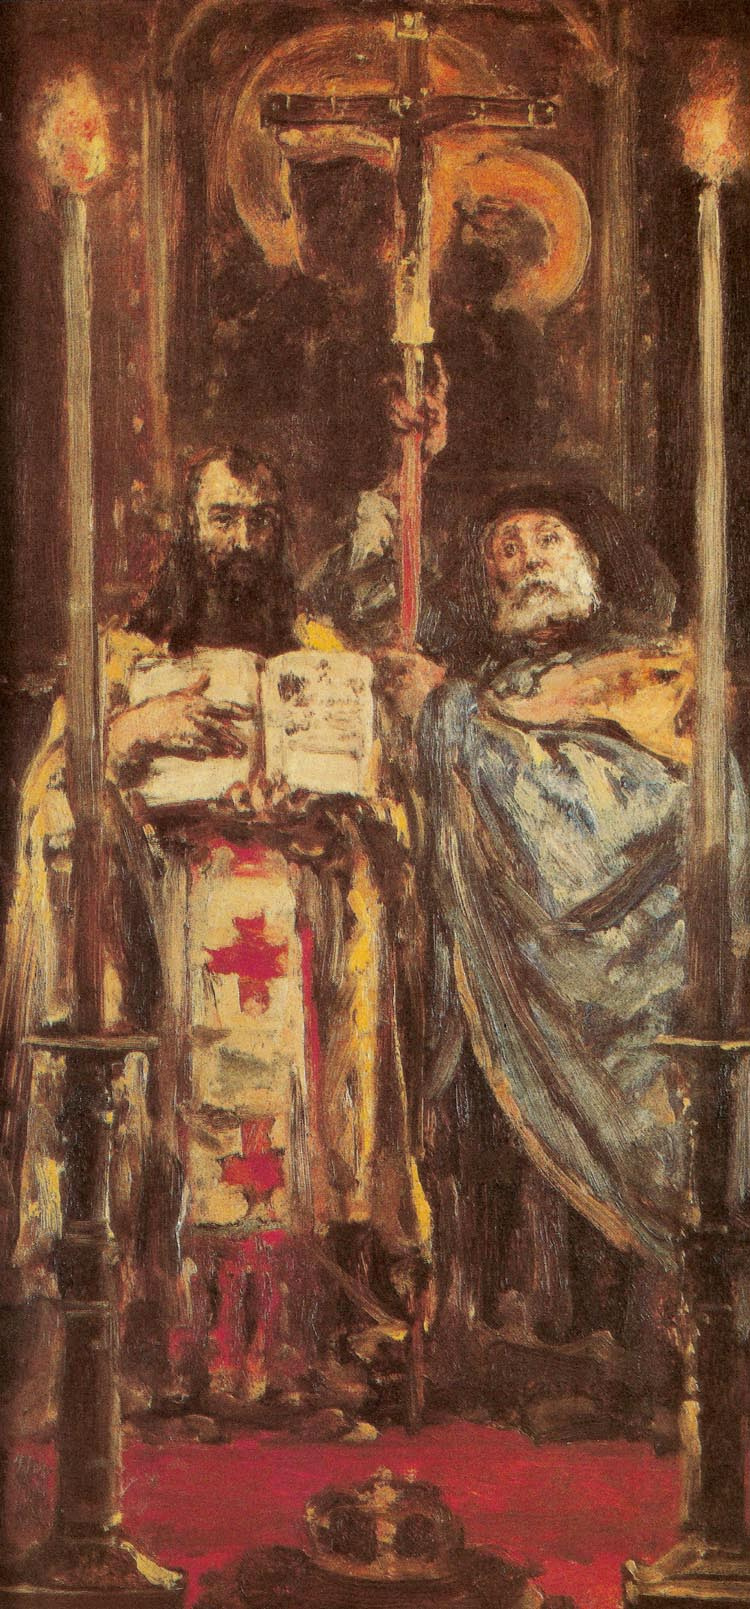 Jan Matejko. Saints Cyril and Methodius. Sketch